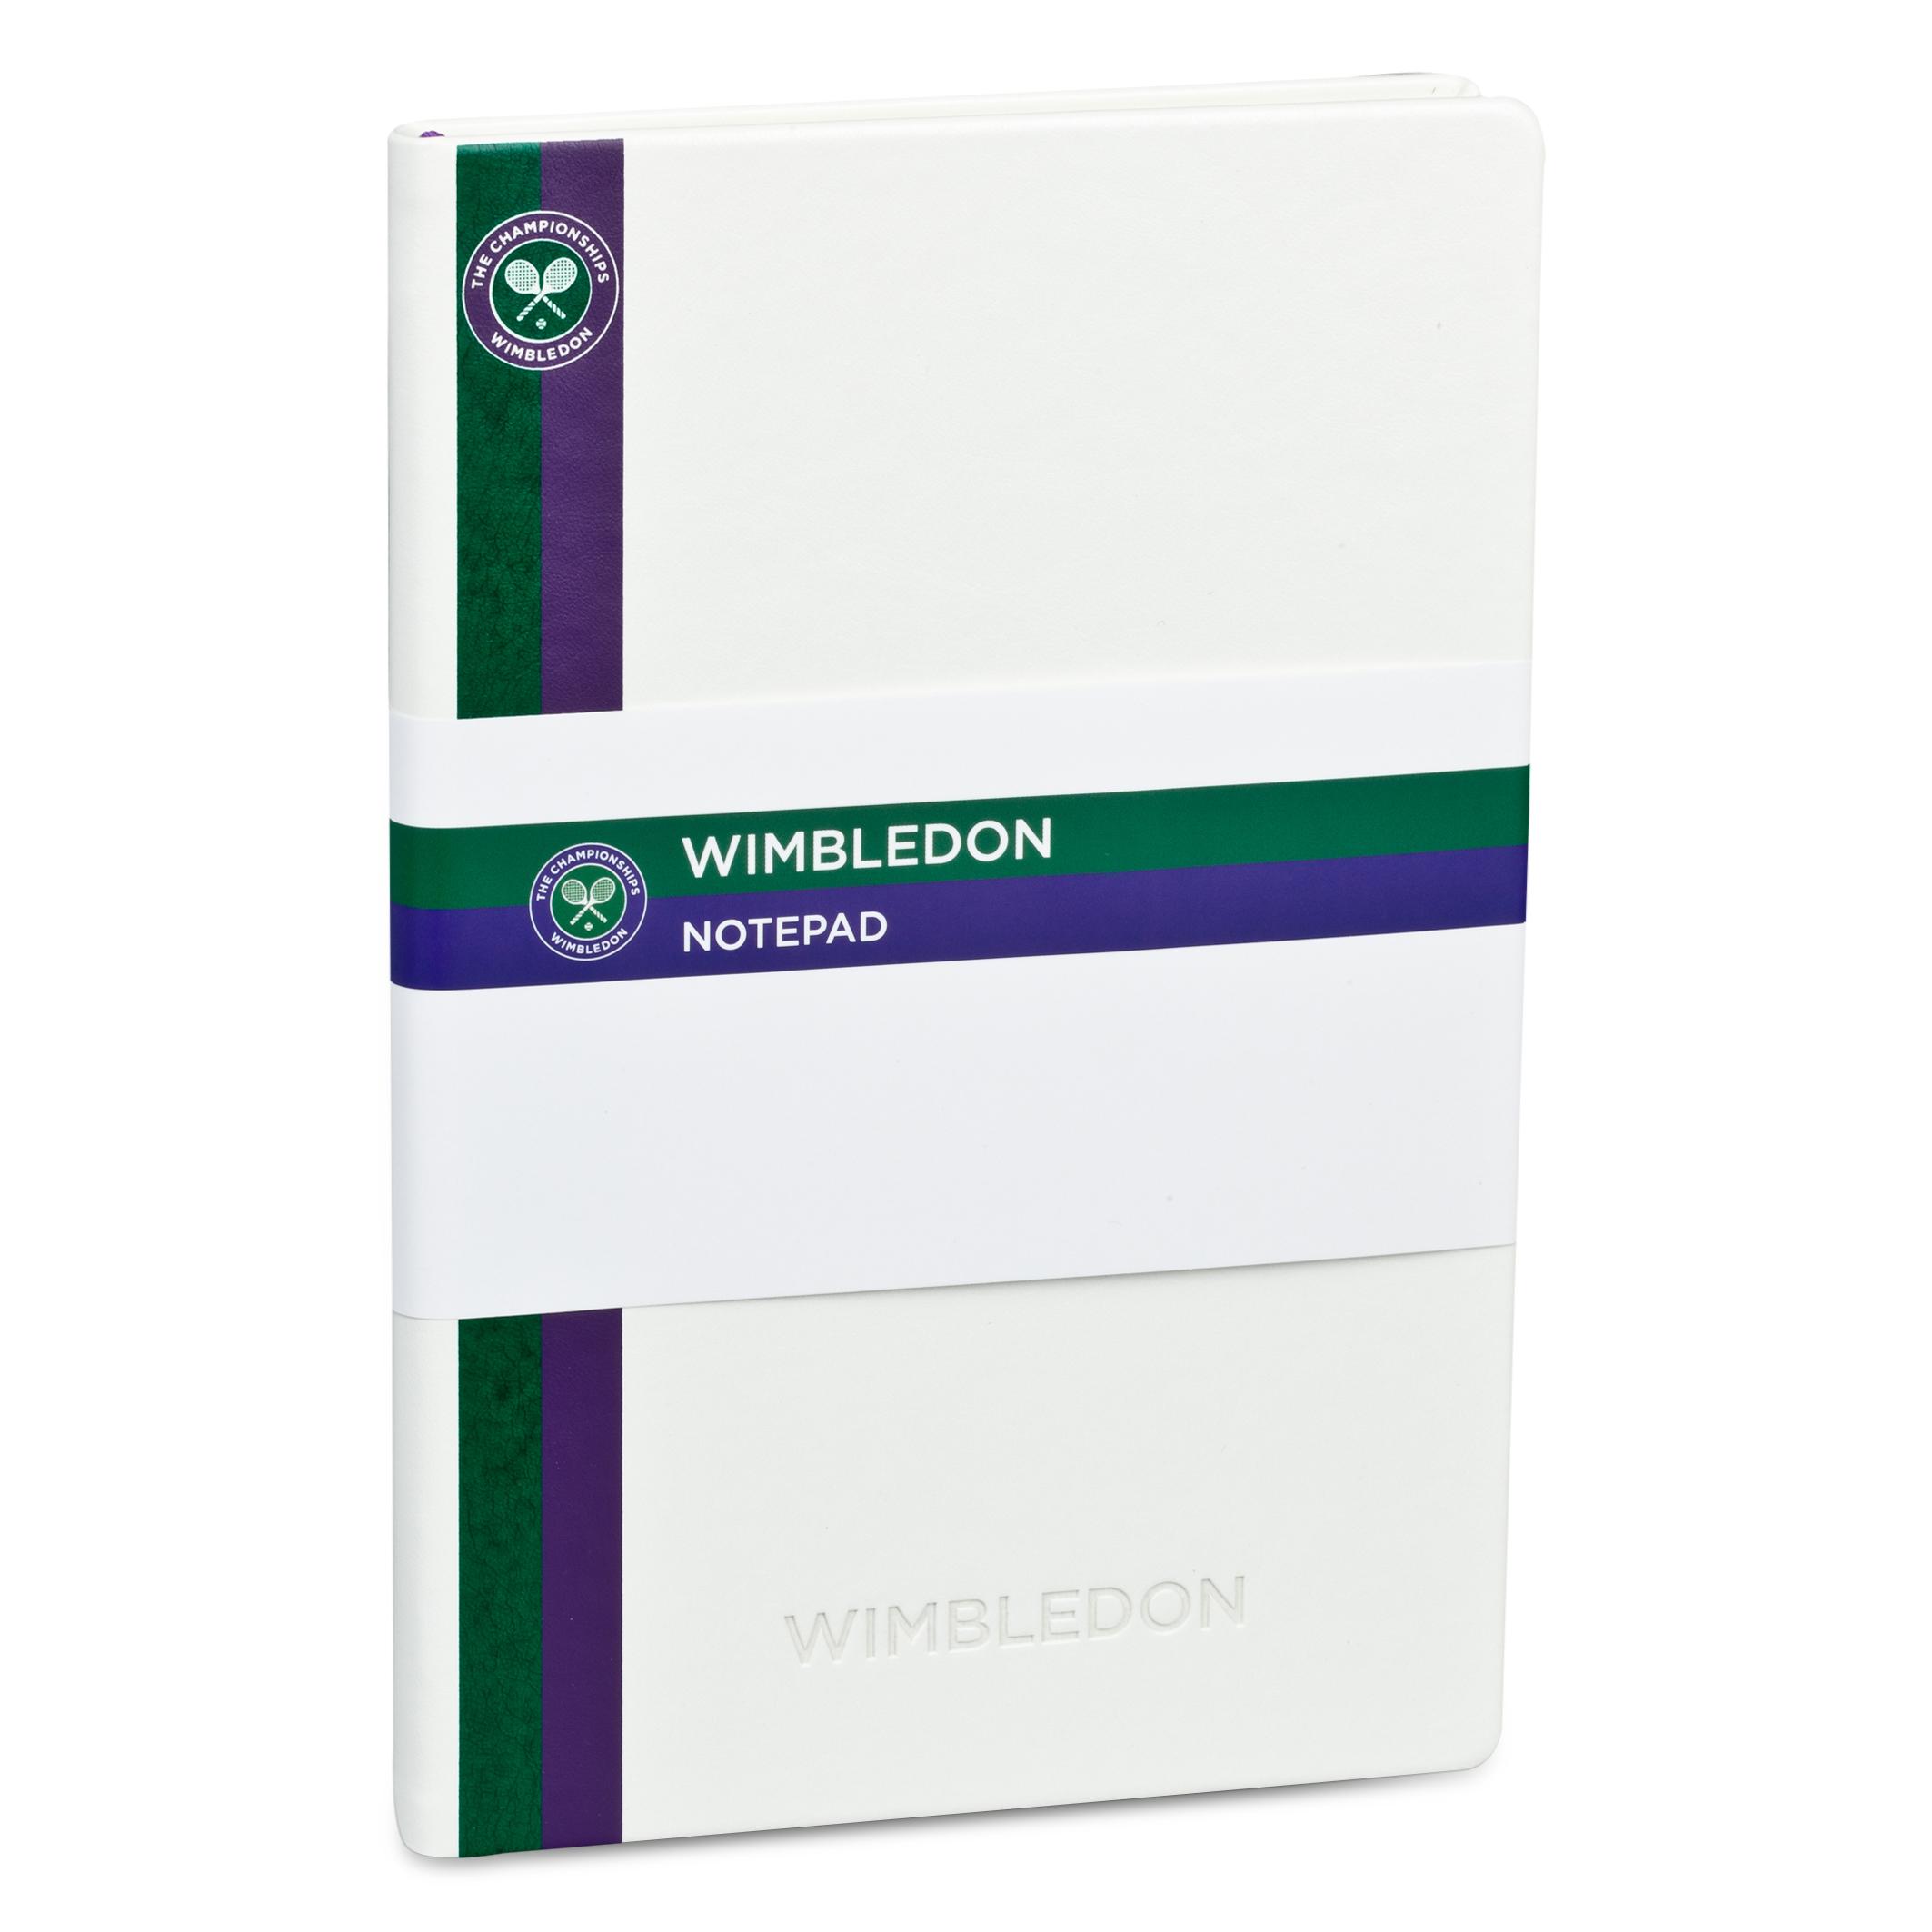 Wimbledon A5 Notepad